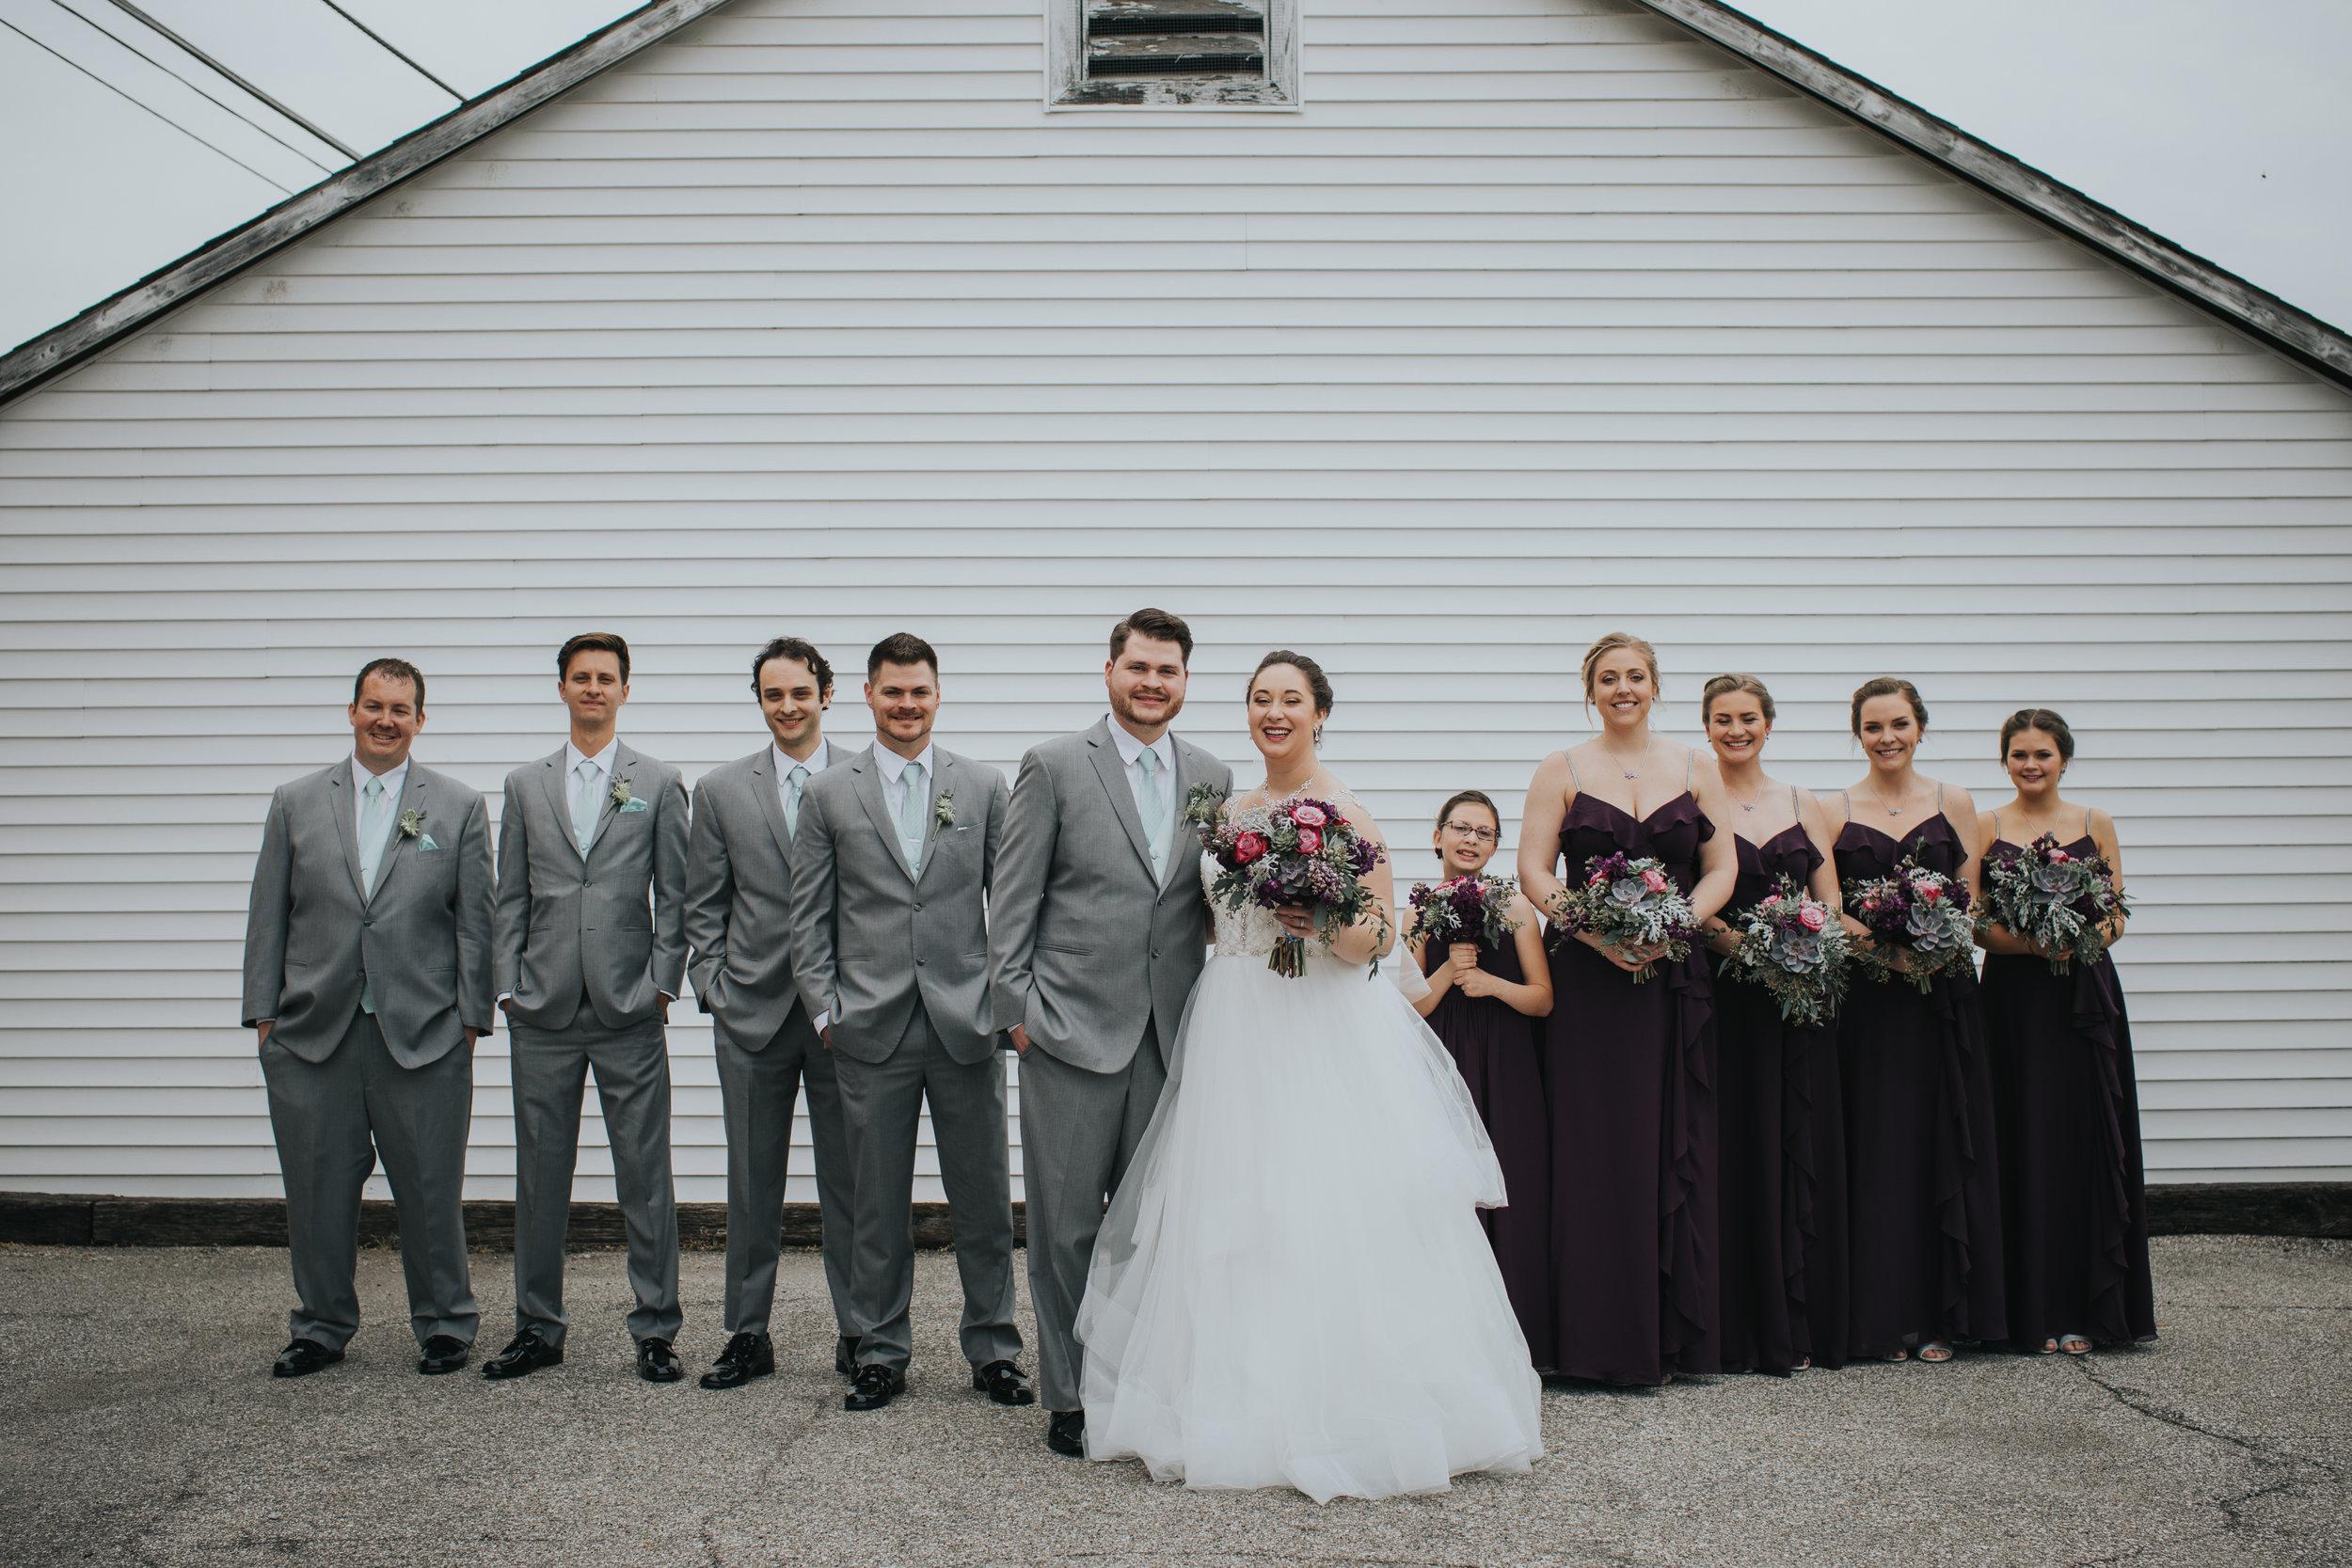 Shelby Dunscomb Wedding